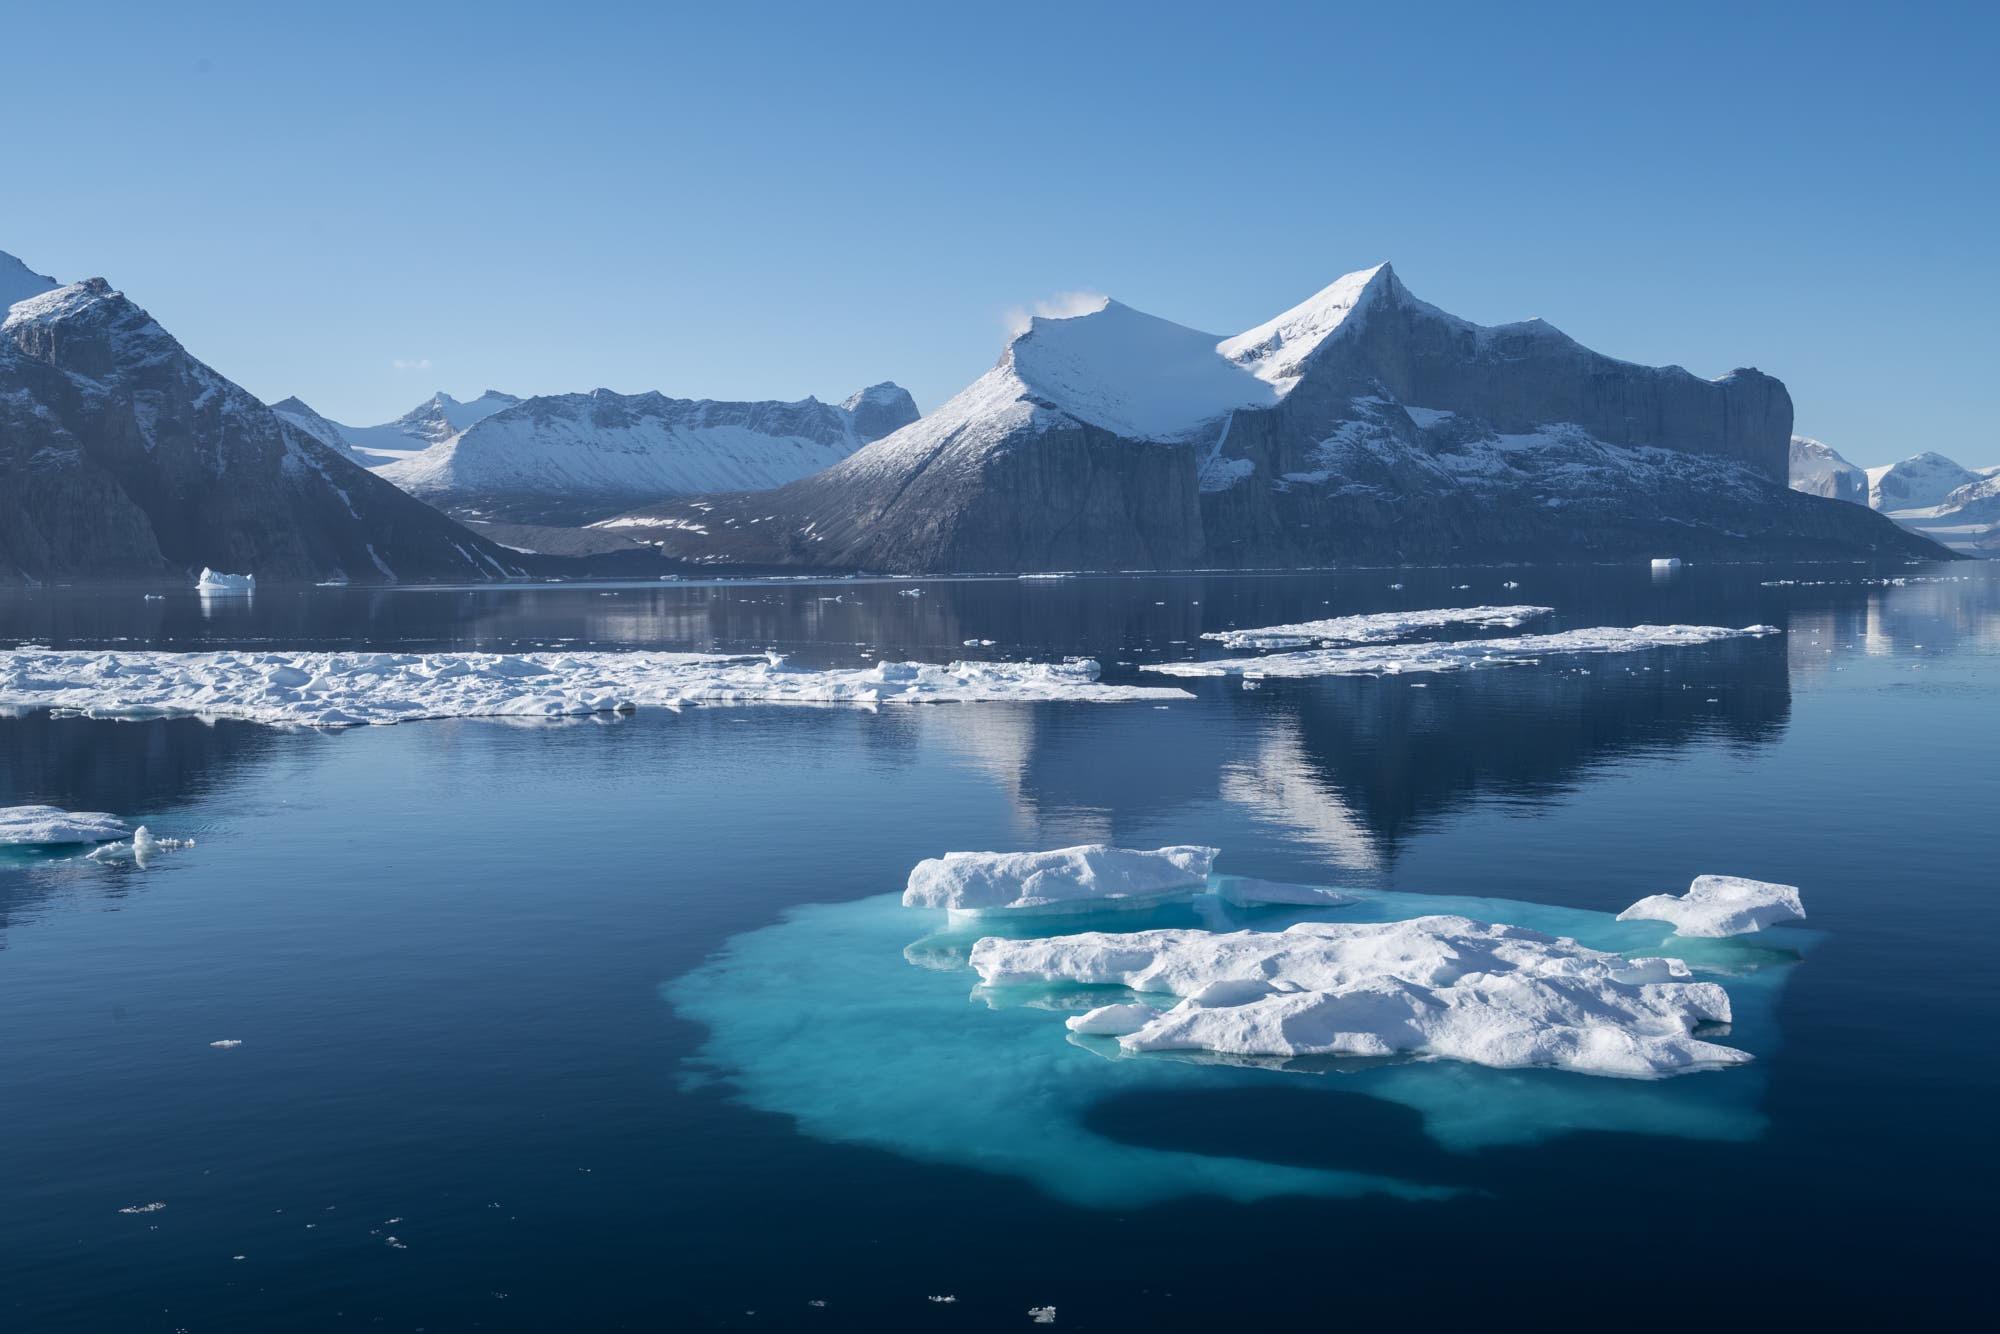 Baffin Island Fjords